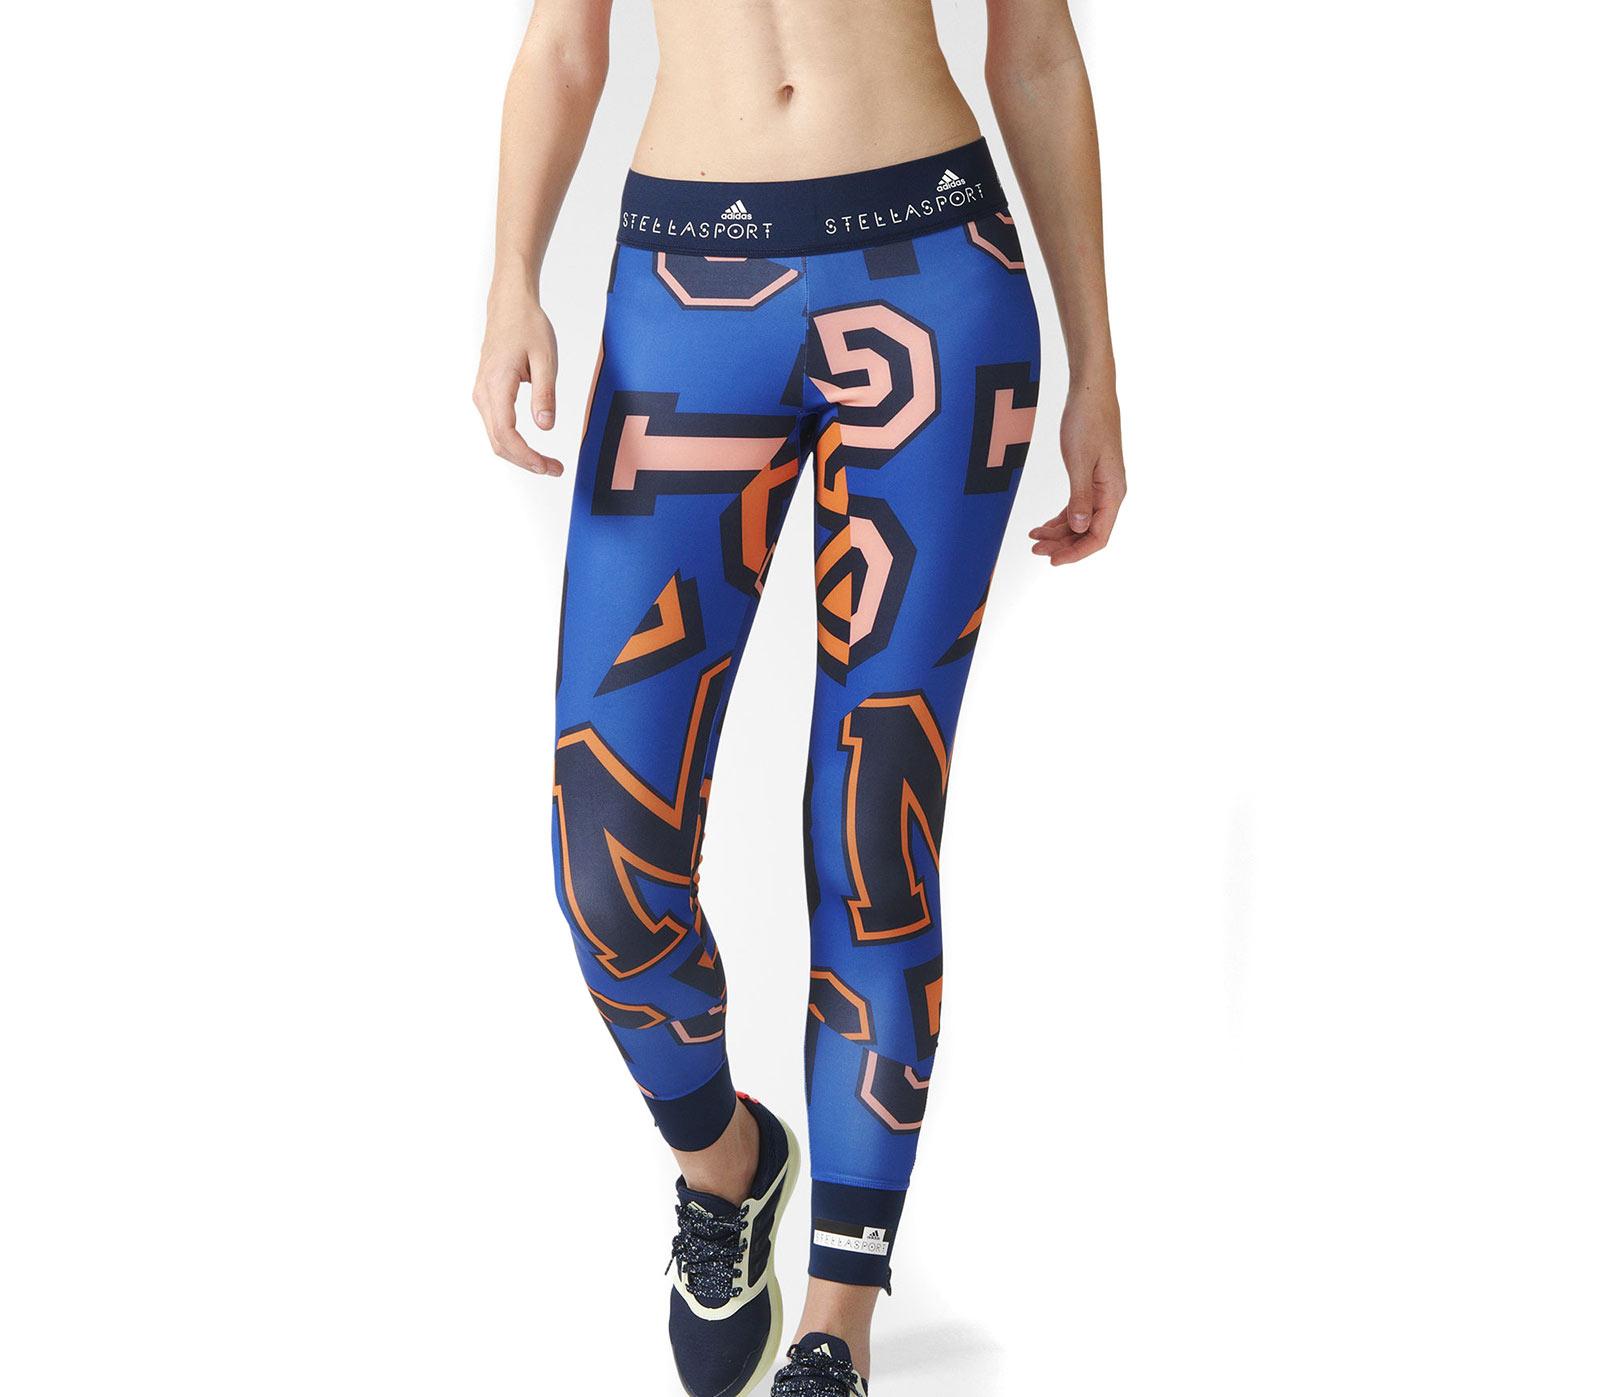 Image is loading New-adidas-Stella-McCartney-Print-Womens-Training-Fitness- 87f70f225